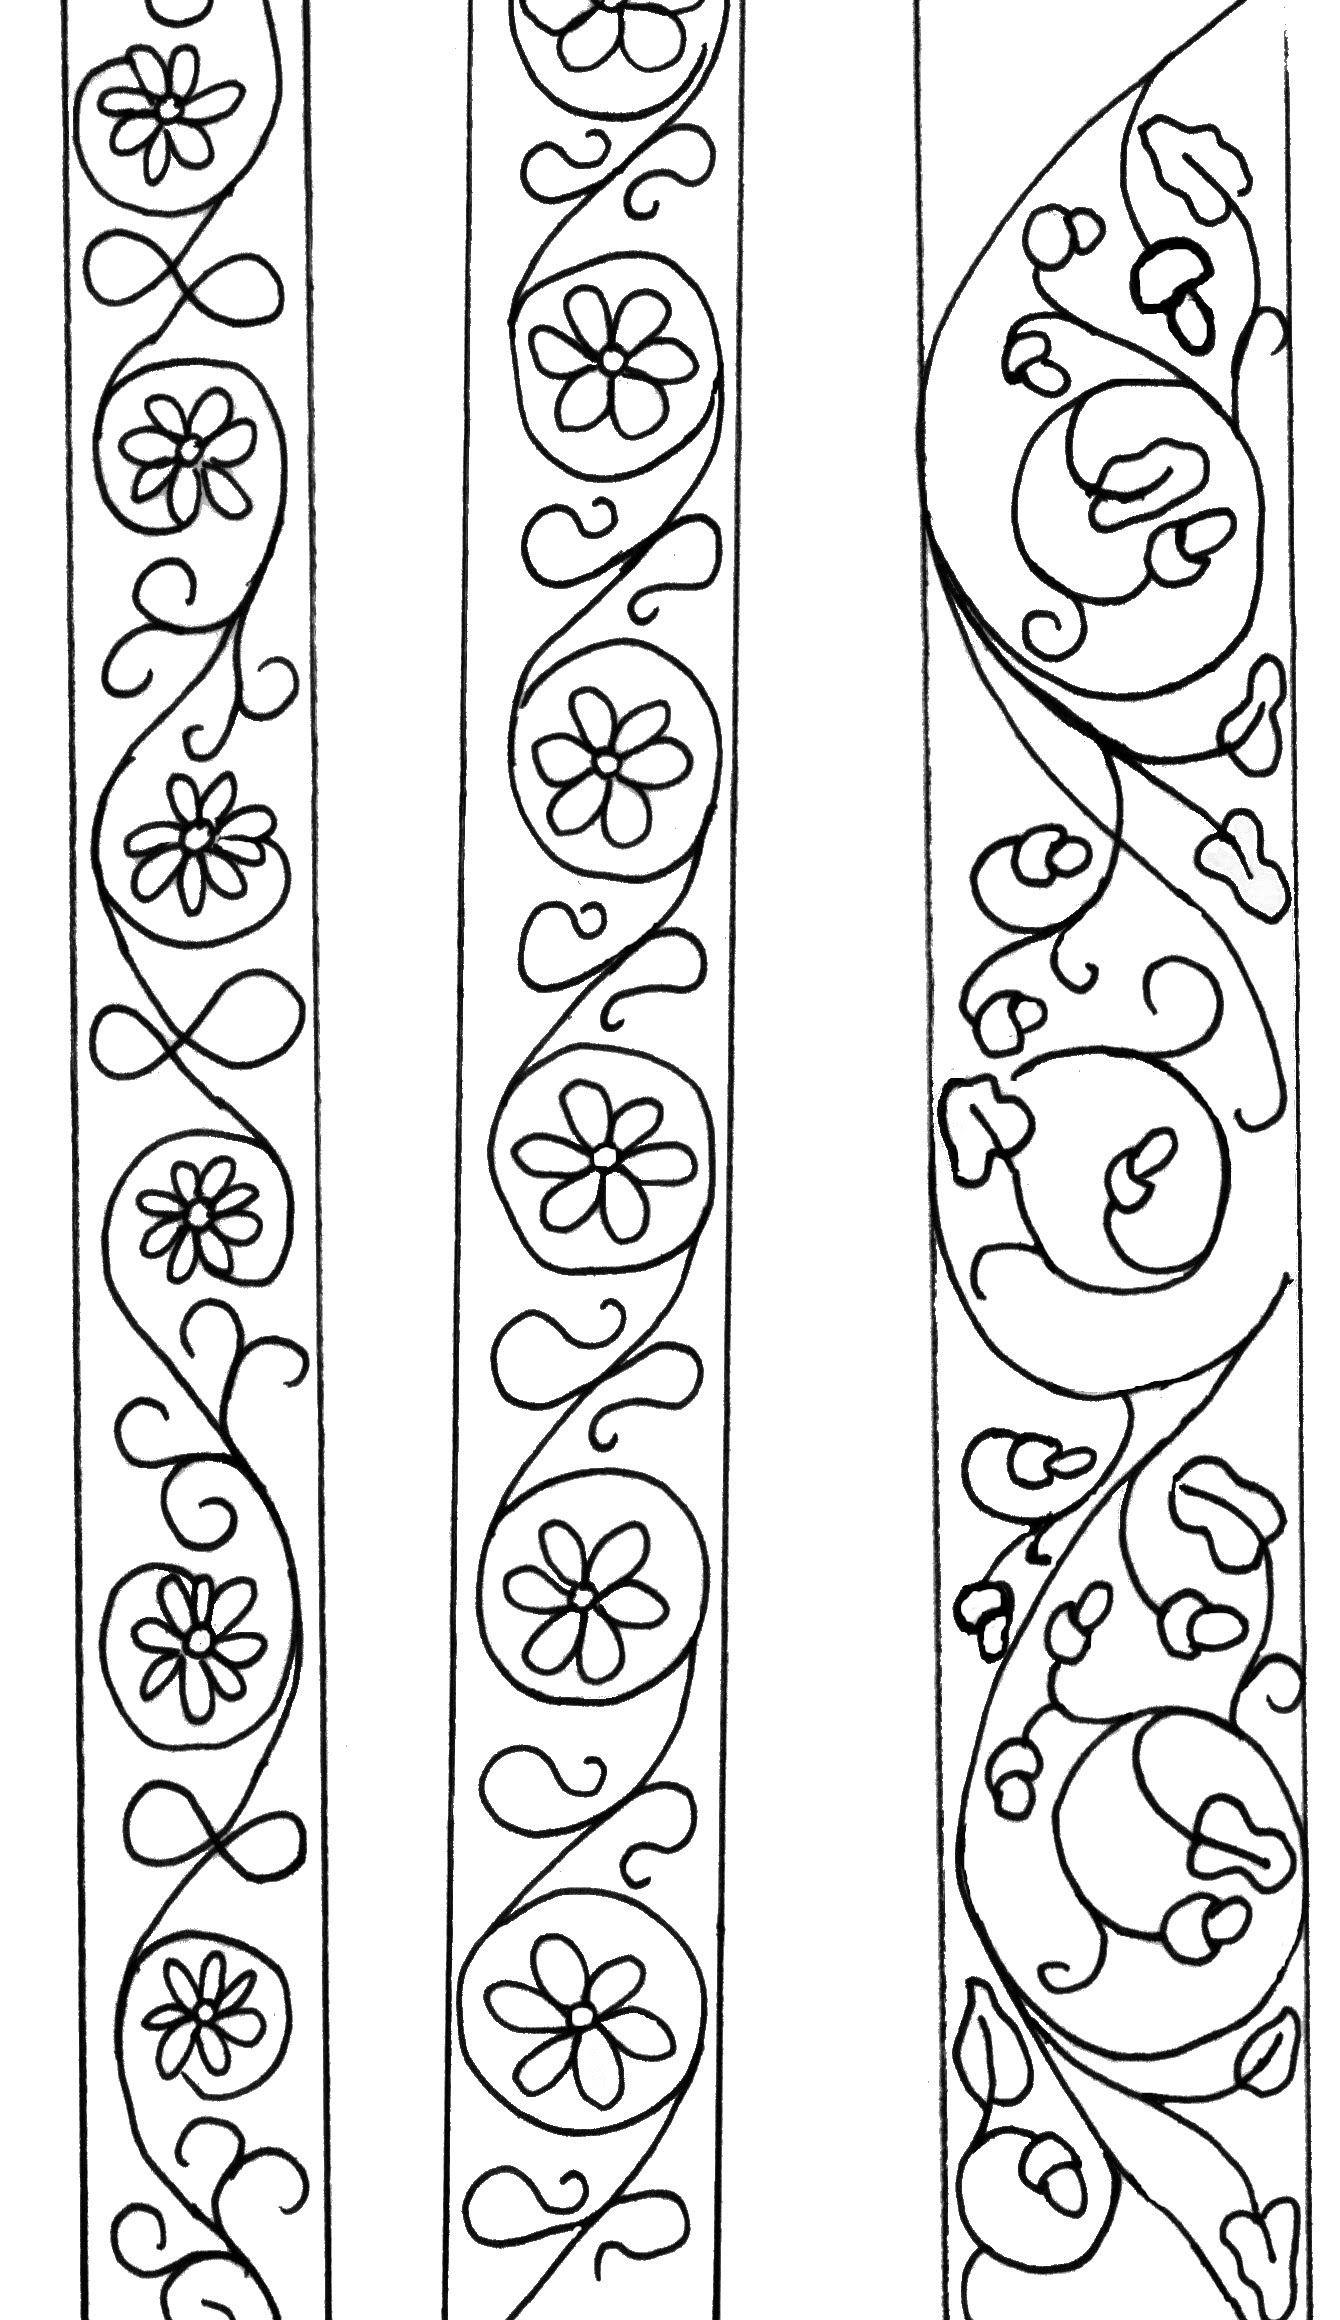 Embroidery pattern målarbolder pinterest embroidery patterns